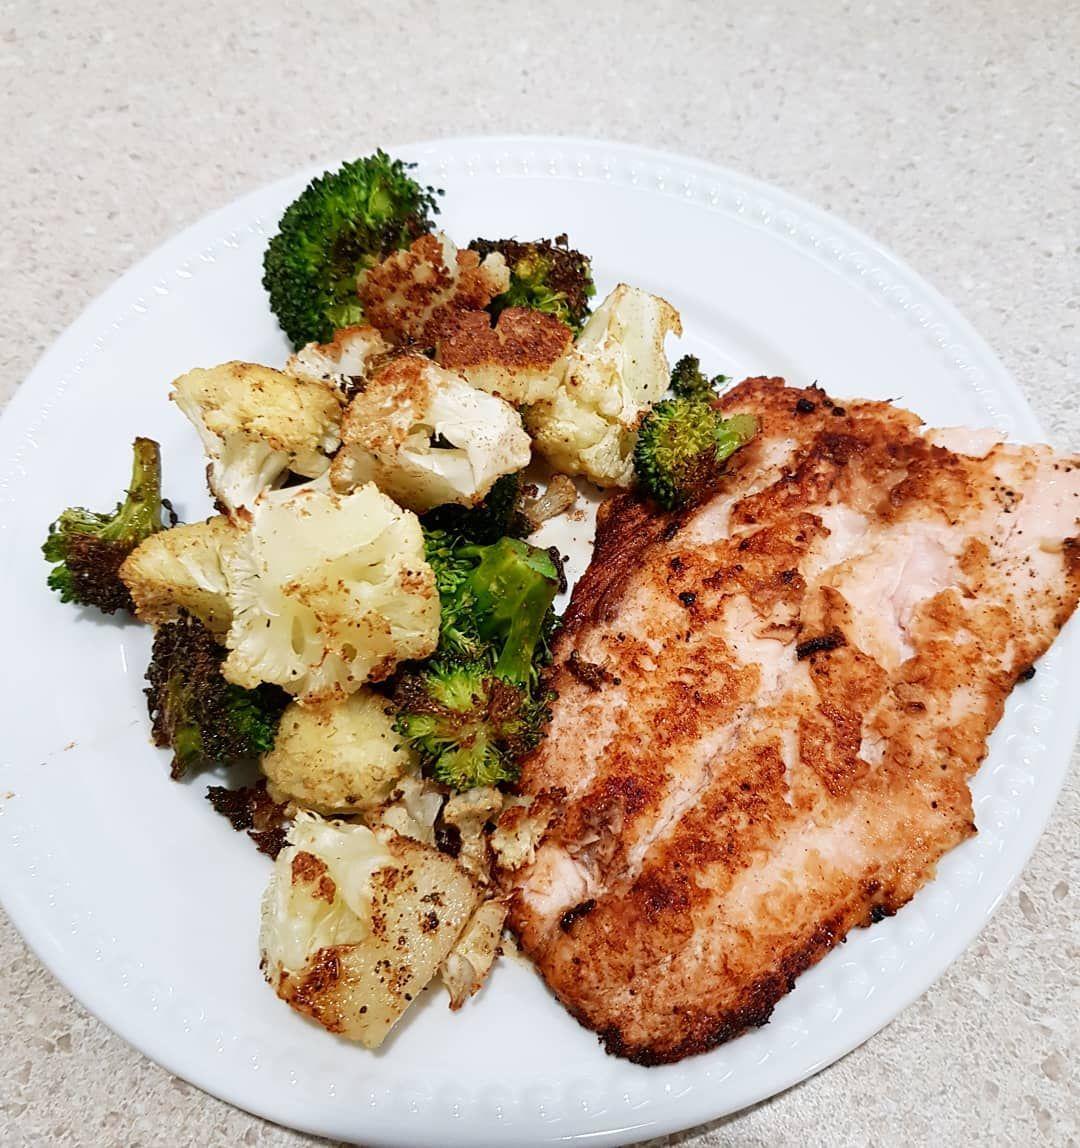 Easy go-to dinner tonight: Pan seared Salmon and oven roasted veggies! . . . . -      Easy go-to dinner tonight: Pan seared Salmon and oven roasted veggies! . . . . #food #dinnertime #insta #instafoodgram #dinnerideas #dinnerrecipes #flavor #foodstagram #foody #homemade #lovetocook #mealoftheday #healthyfood #instafood #salmon #roastedveggies #broccoli #cauliflower #fish #peixe #flexitarian     The Effective Pictures We Offer You About weeknight Dinner Recipes      A quality picture can tell yo